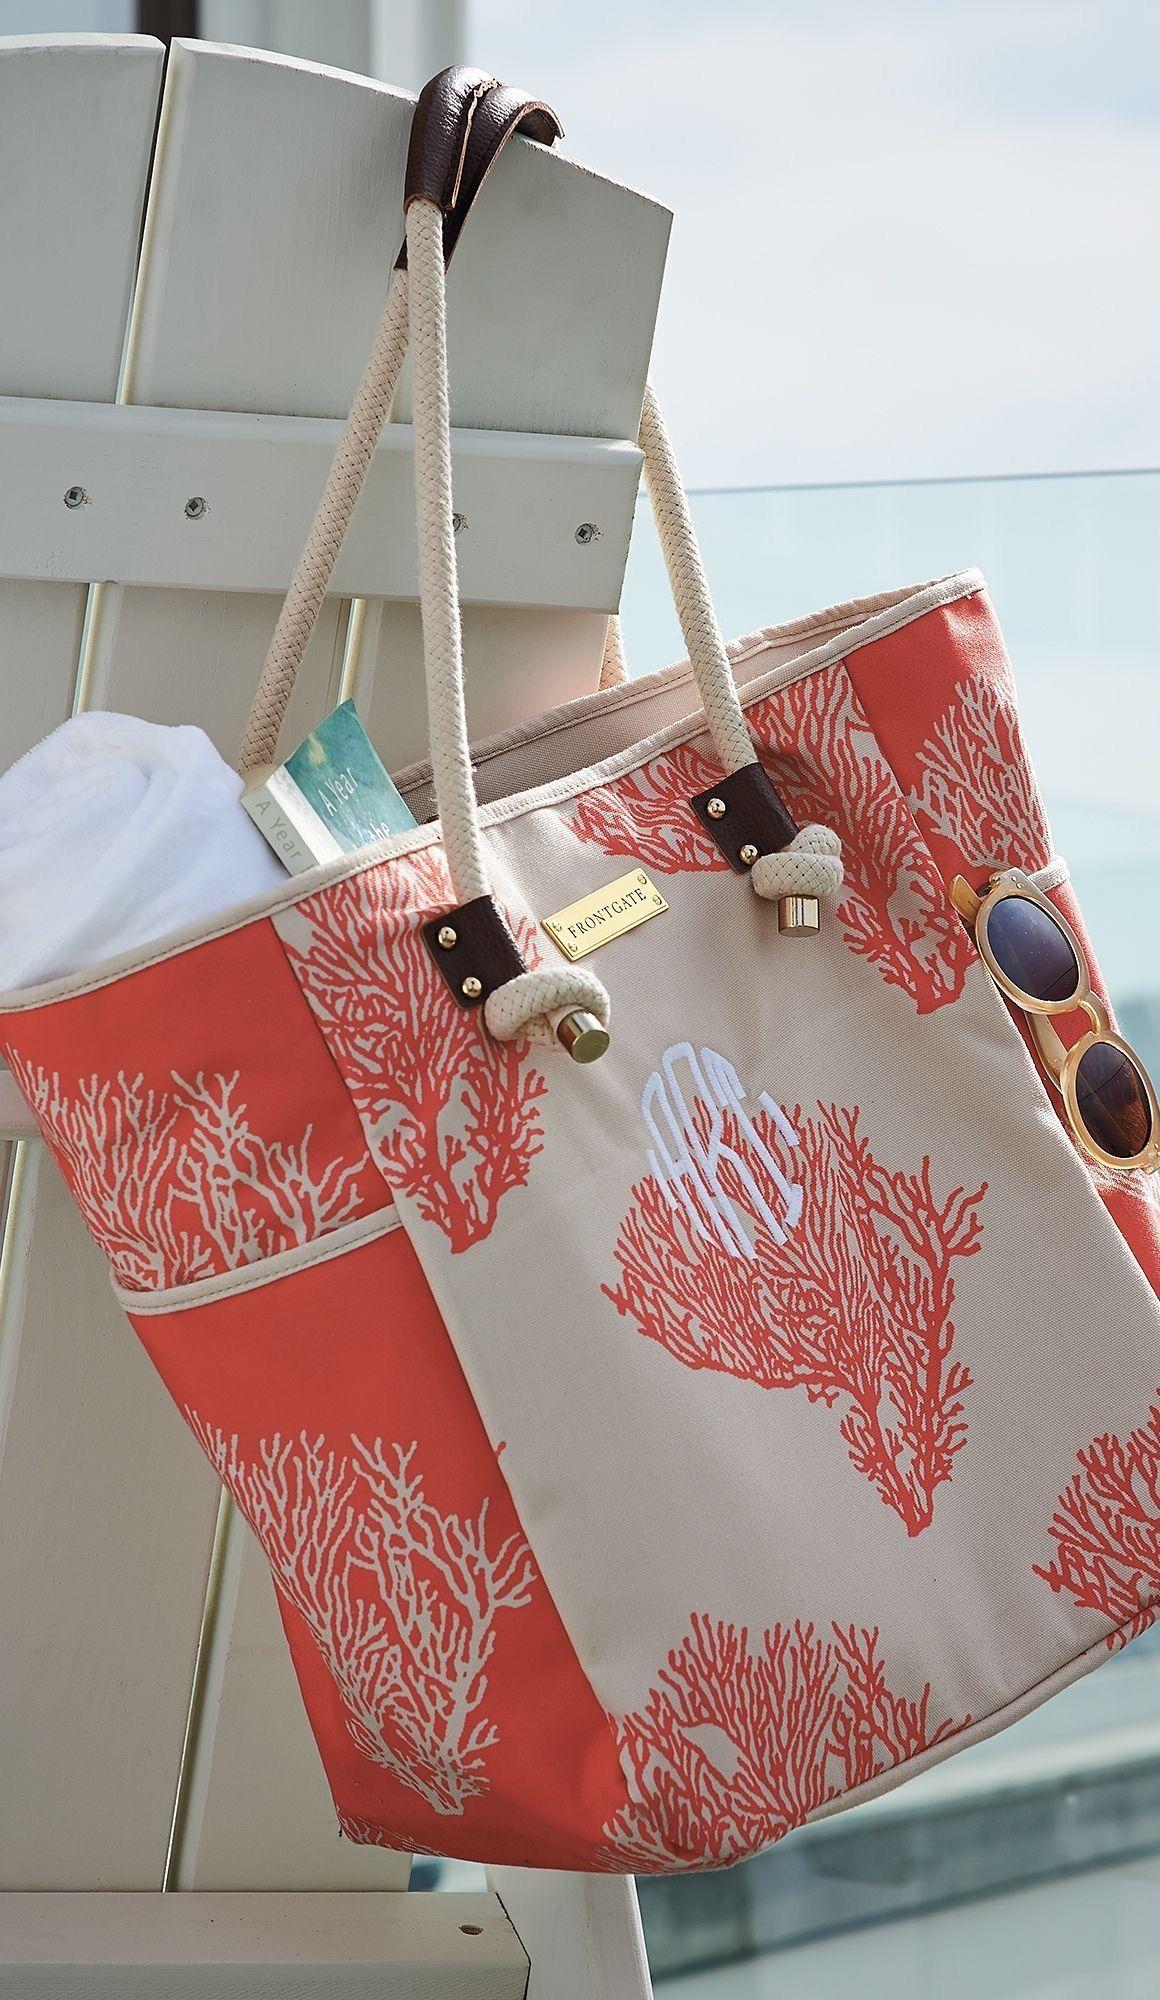 y Tela tela de bag~ Bolsos Pinterest beach Bolsos Bags P0xUBY8